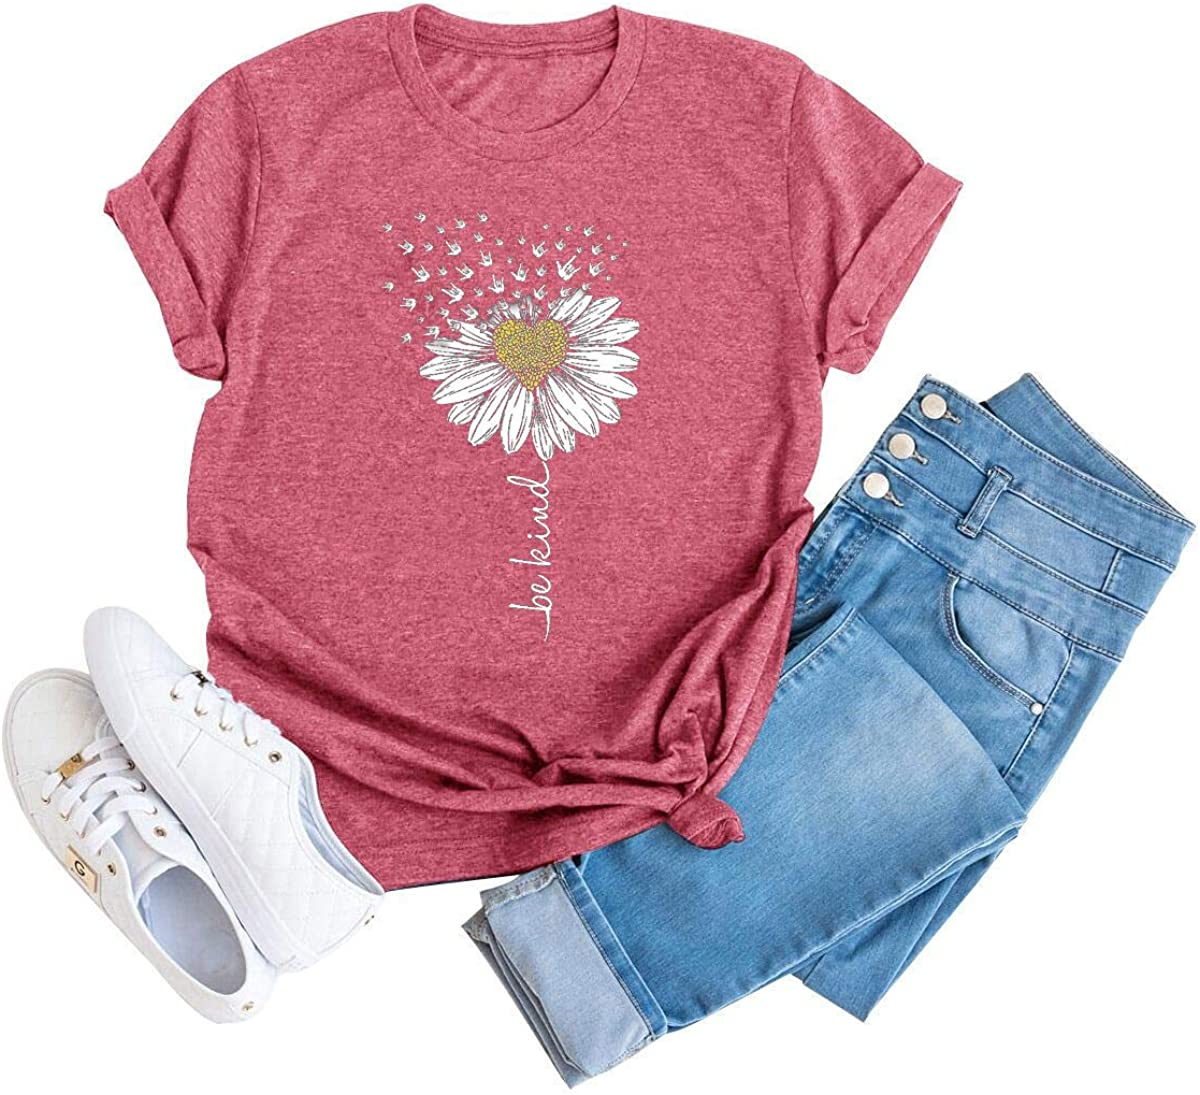 Be Kind Shirt Women Sunflower Graphic Tee Wildflower Short Sleeve Inspirational Tops